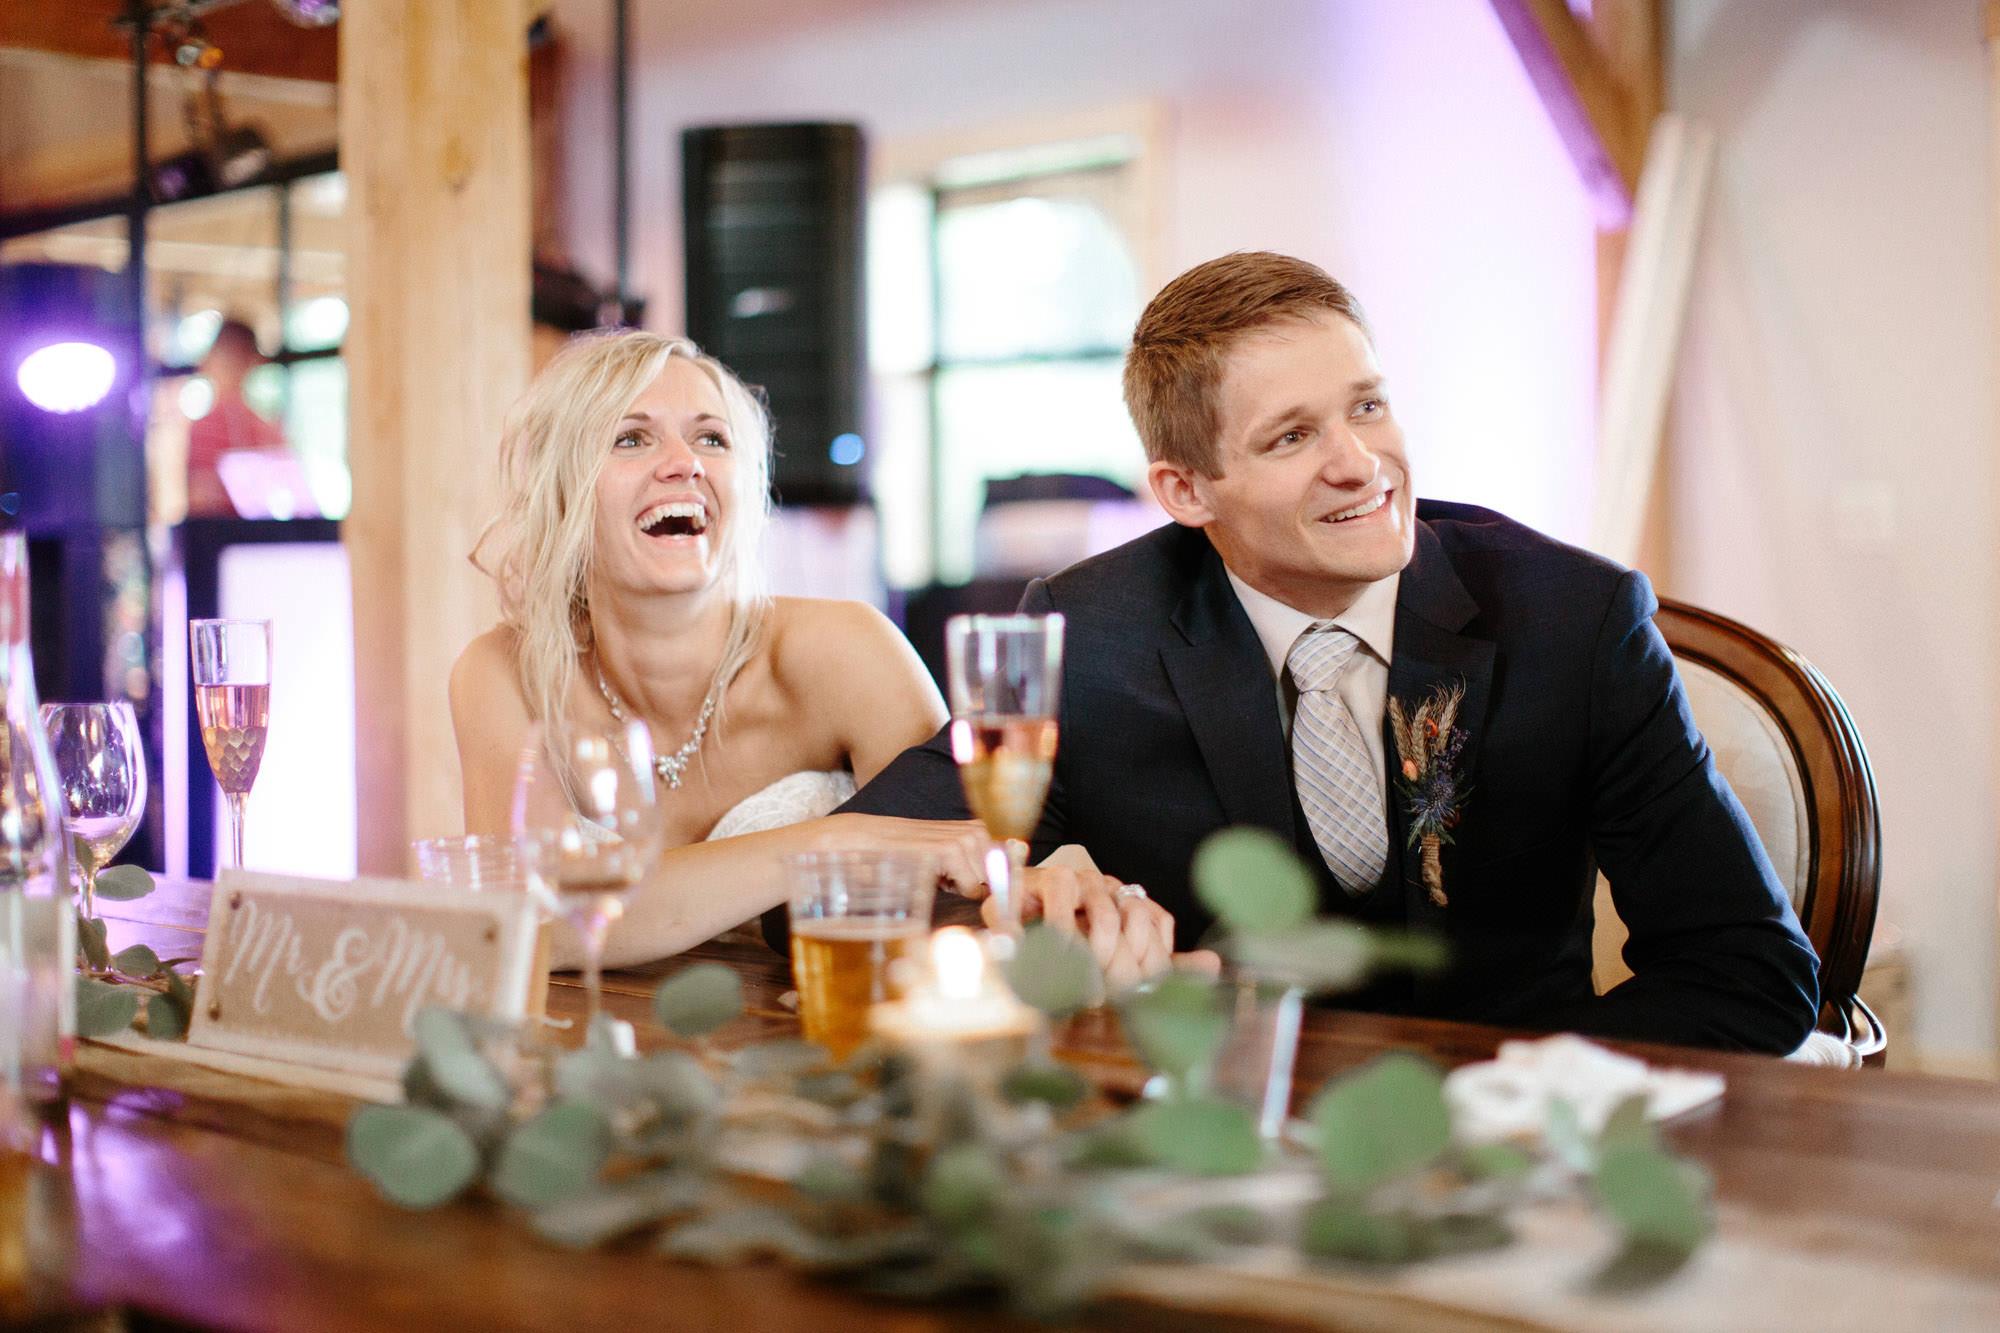 meadow-barn-wedding-sioux-falls-south-dakota-romantic-adventerous-michael-liedtke-photography073.jpg